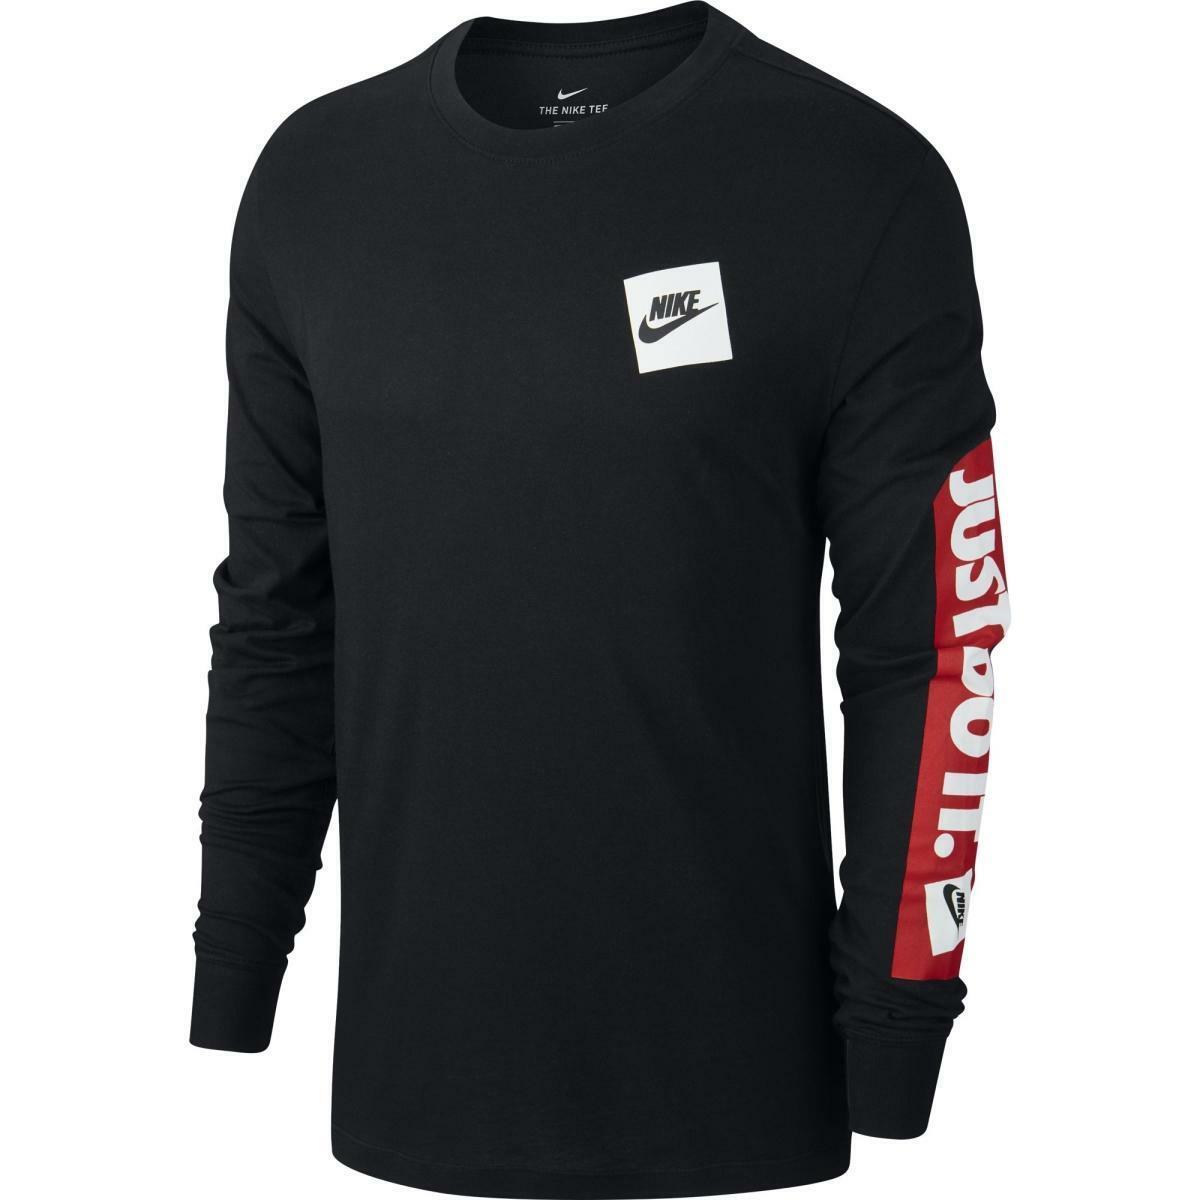 nike t-shirt uomo nike cd9598 010 nero